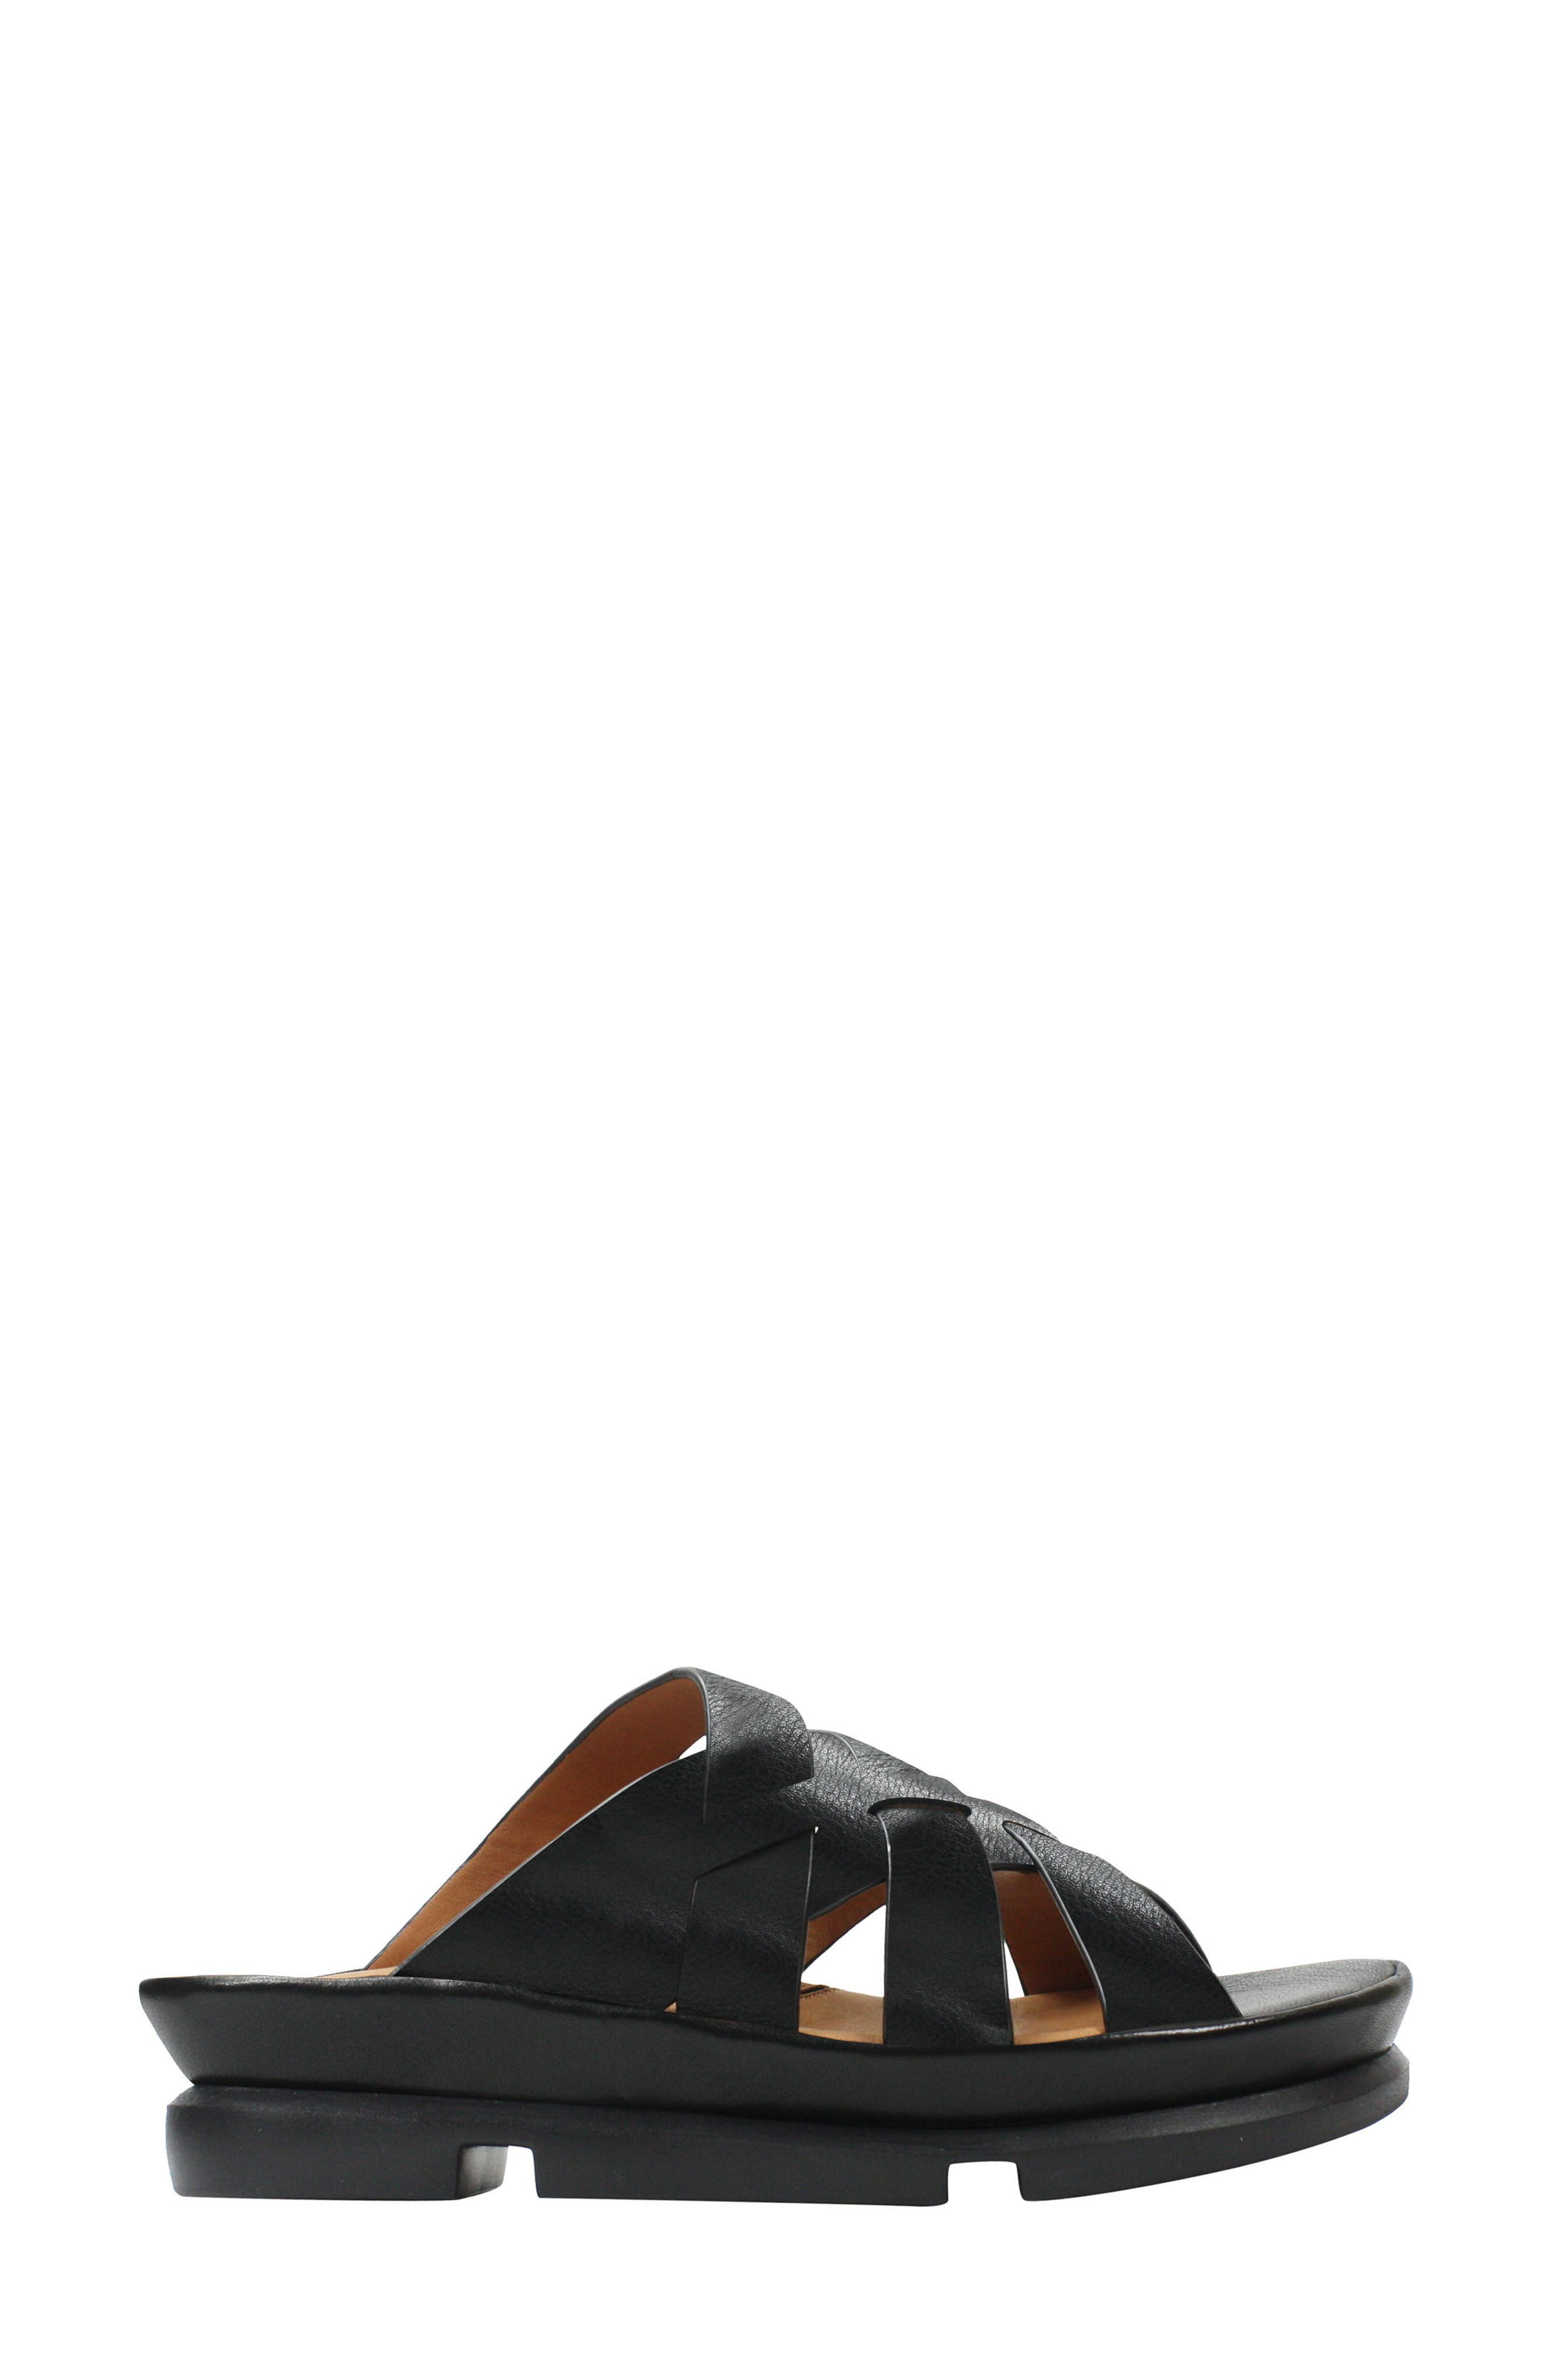 Veryl Sandal,                             Alternate thumbnail 3, color,                             Black Leather